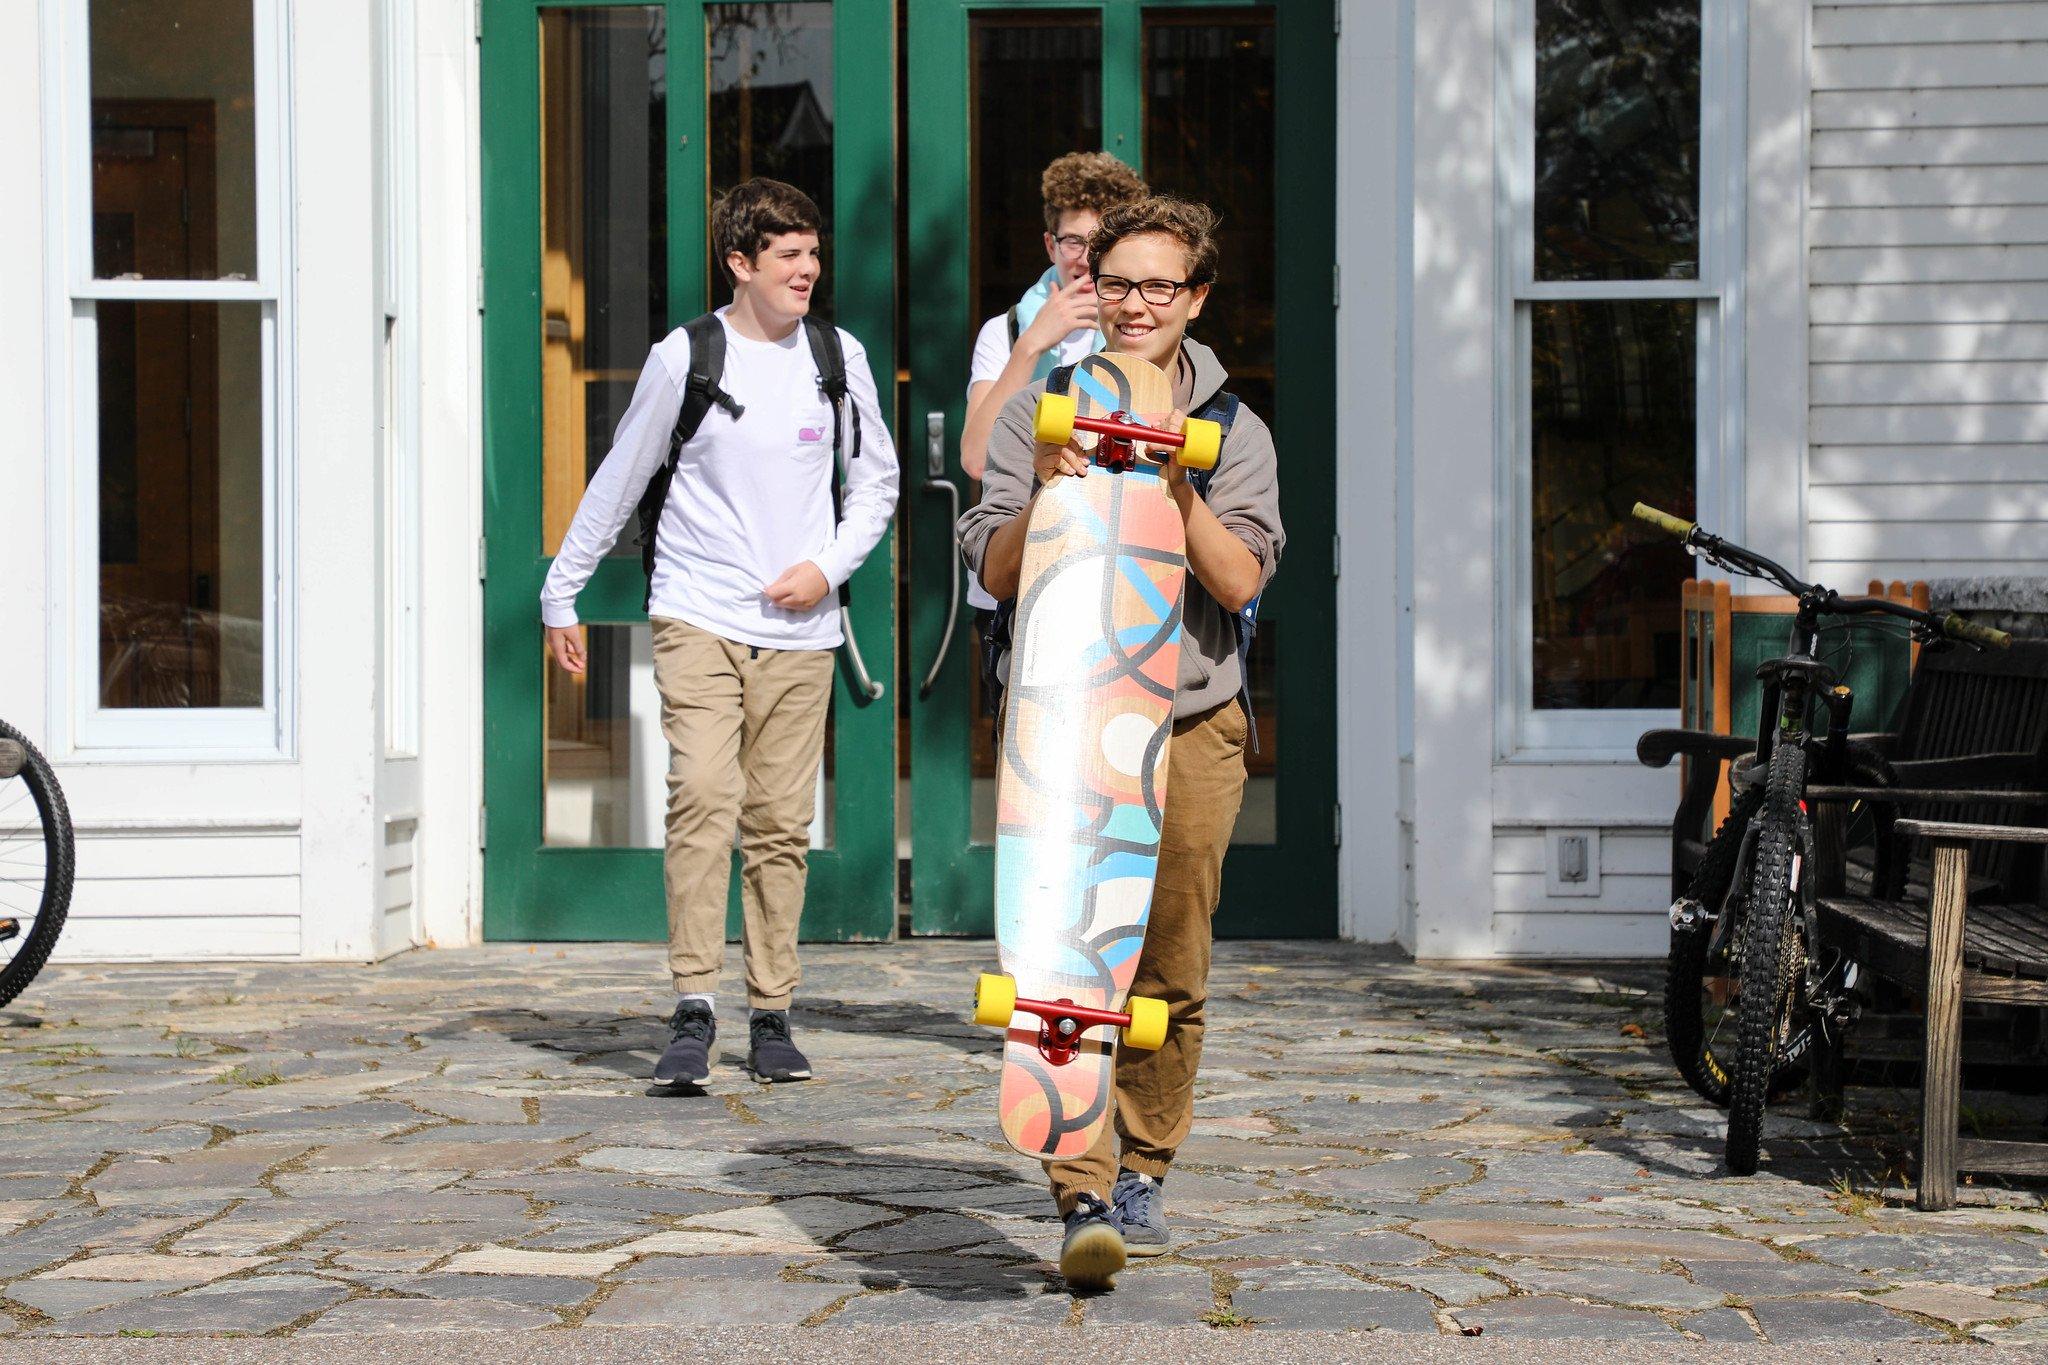 Proctor Academy Boarding Prep School New EnglandProctor Academy Boarding Prep School New England